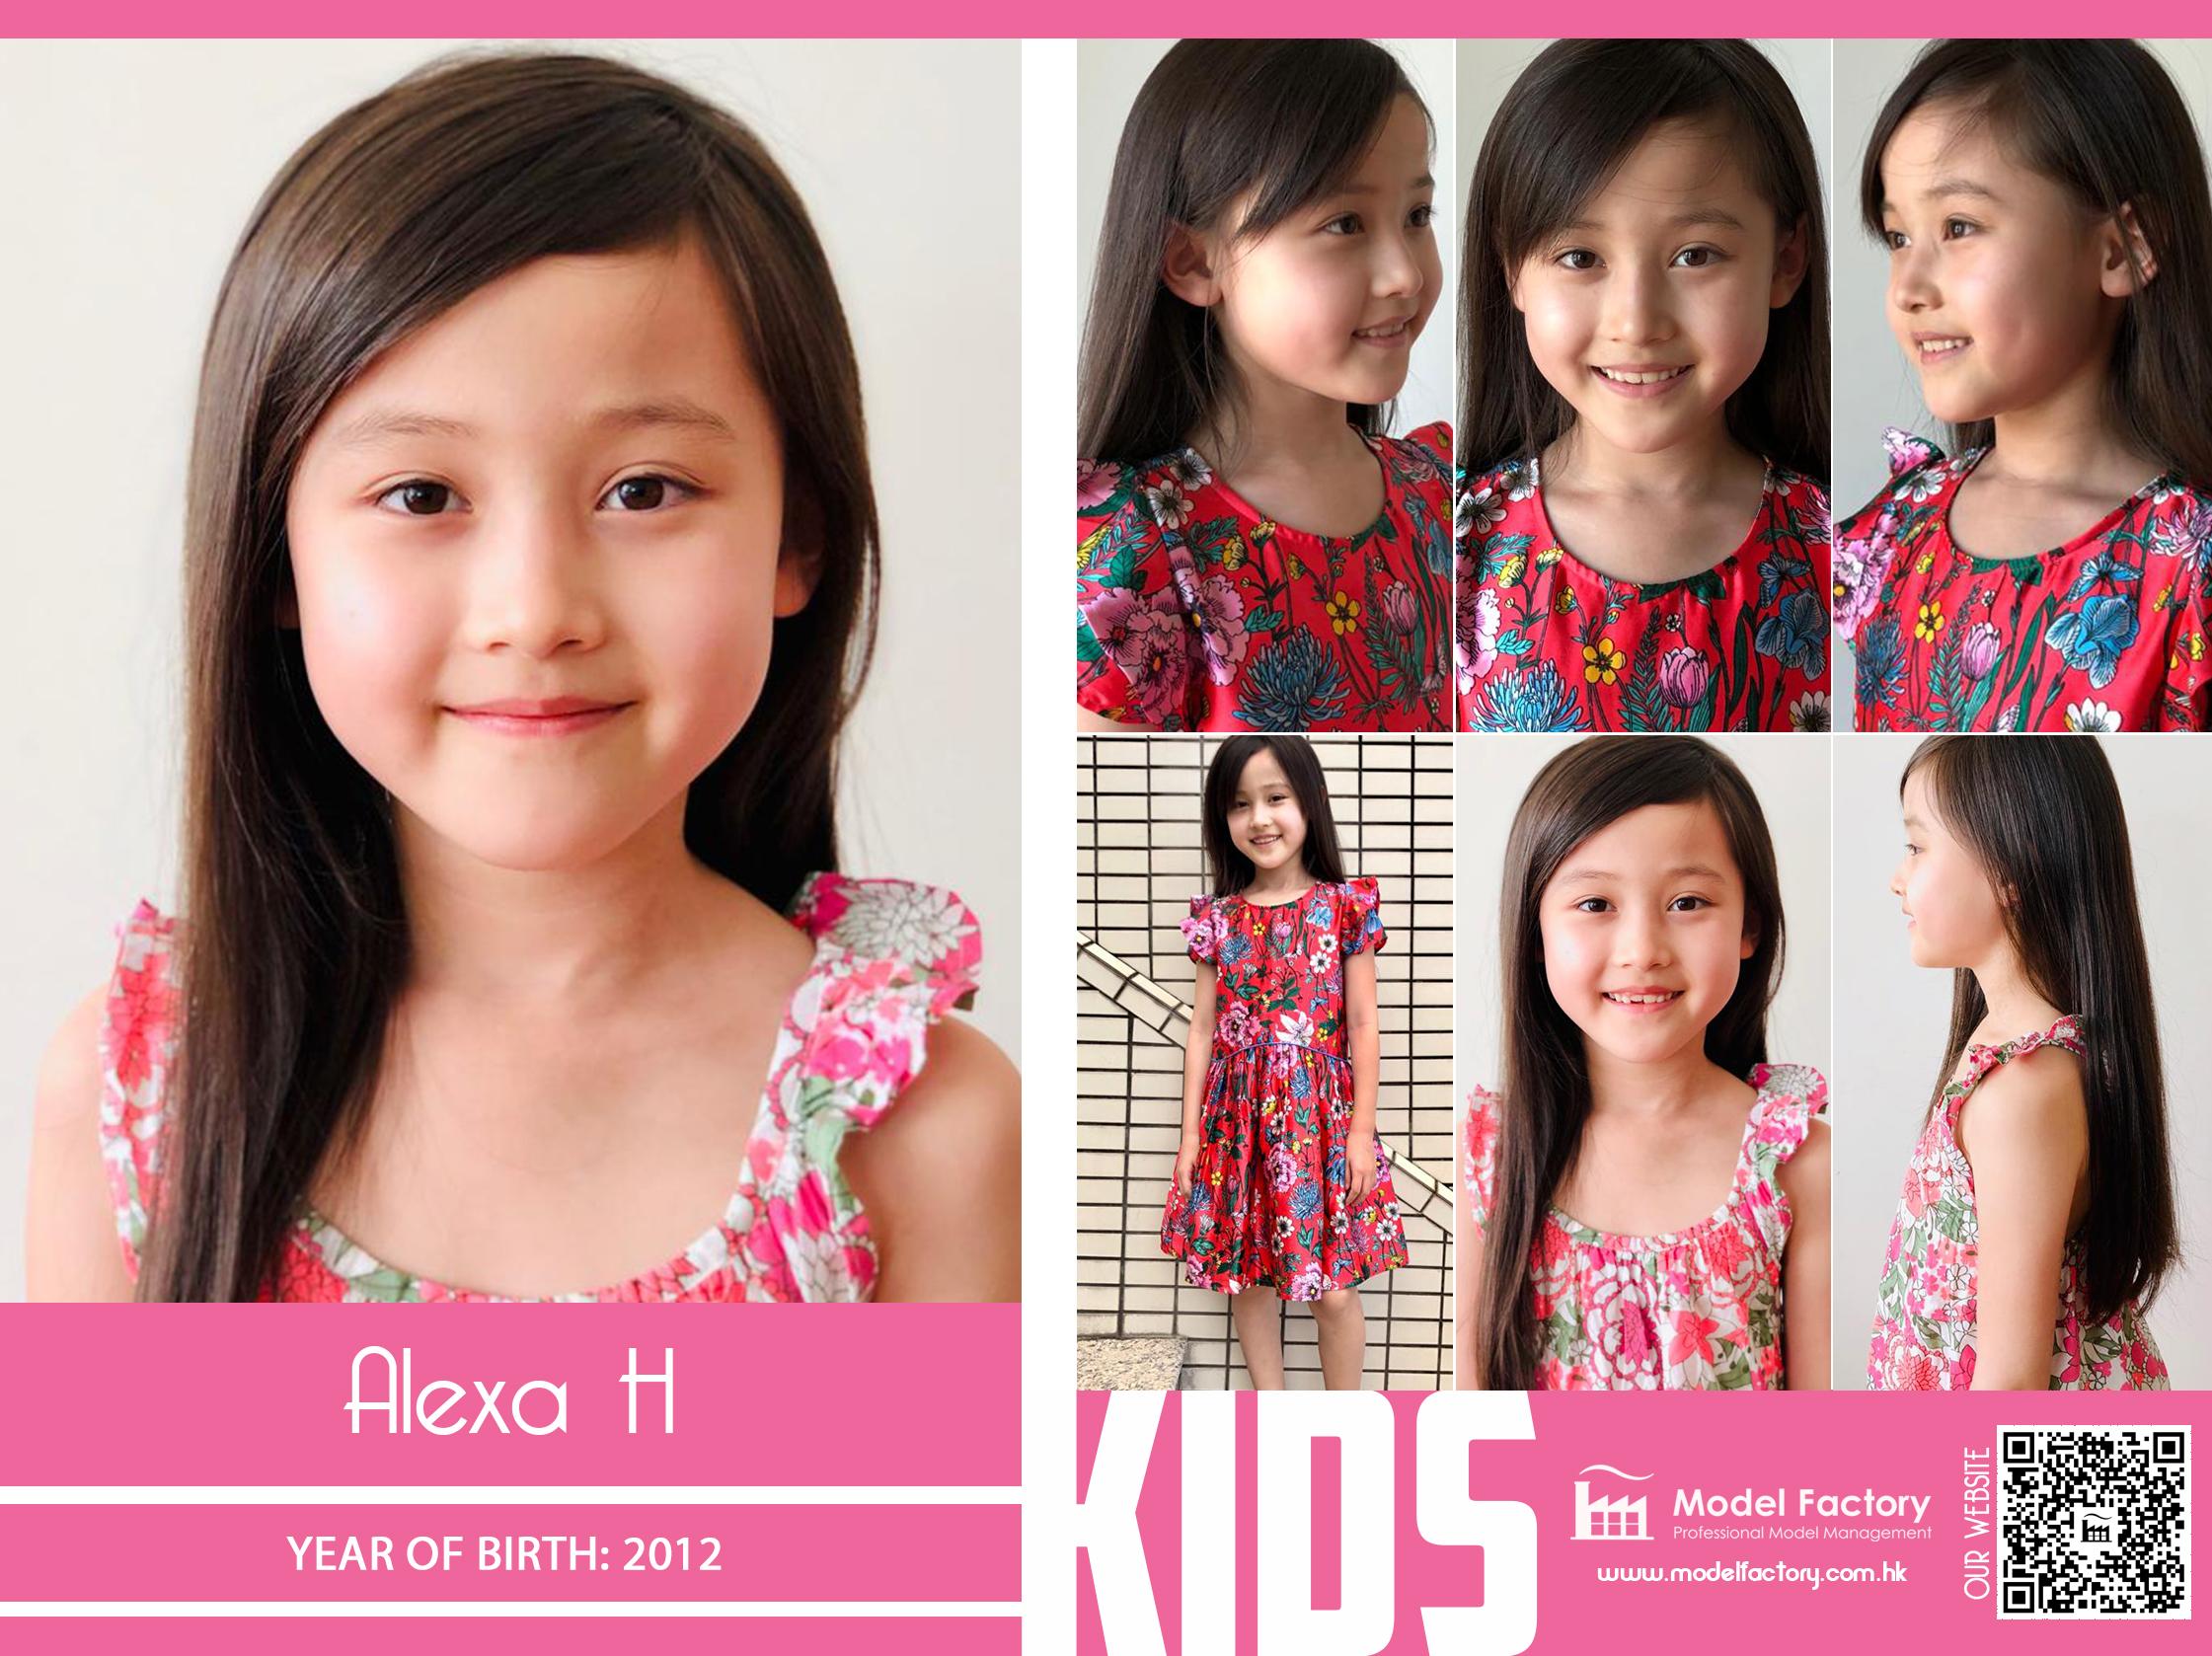 Model Factory Mix Kids Model Alexa H